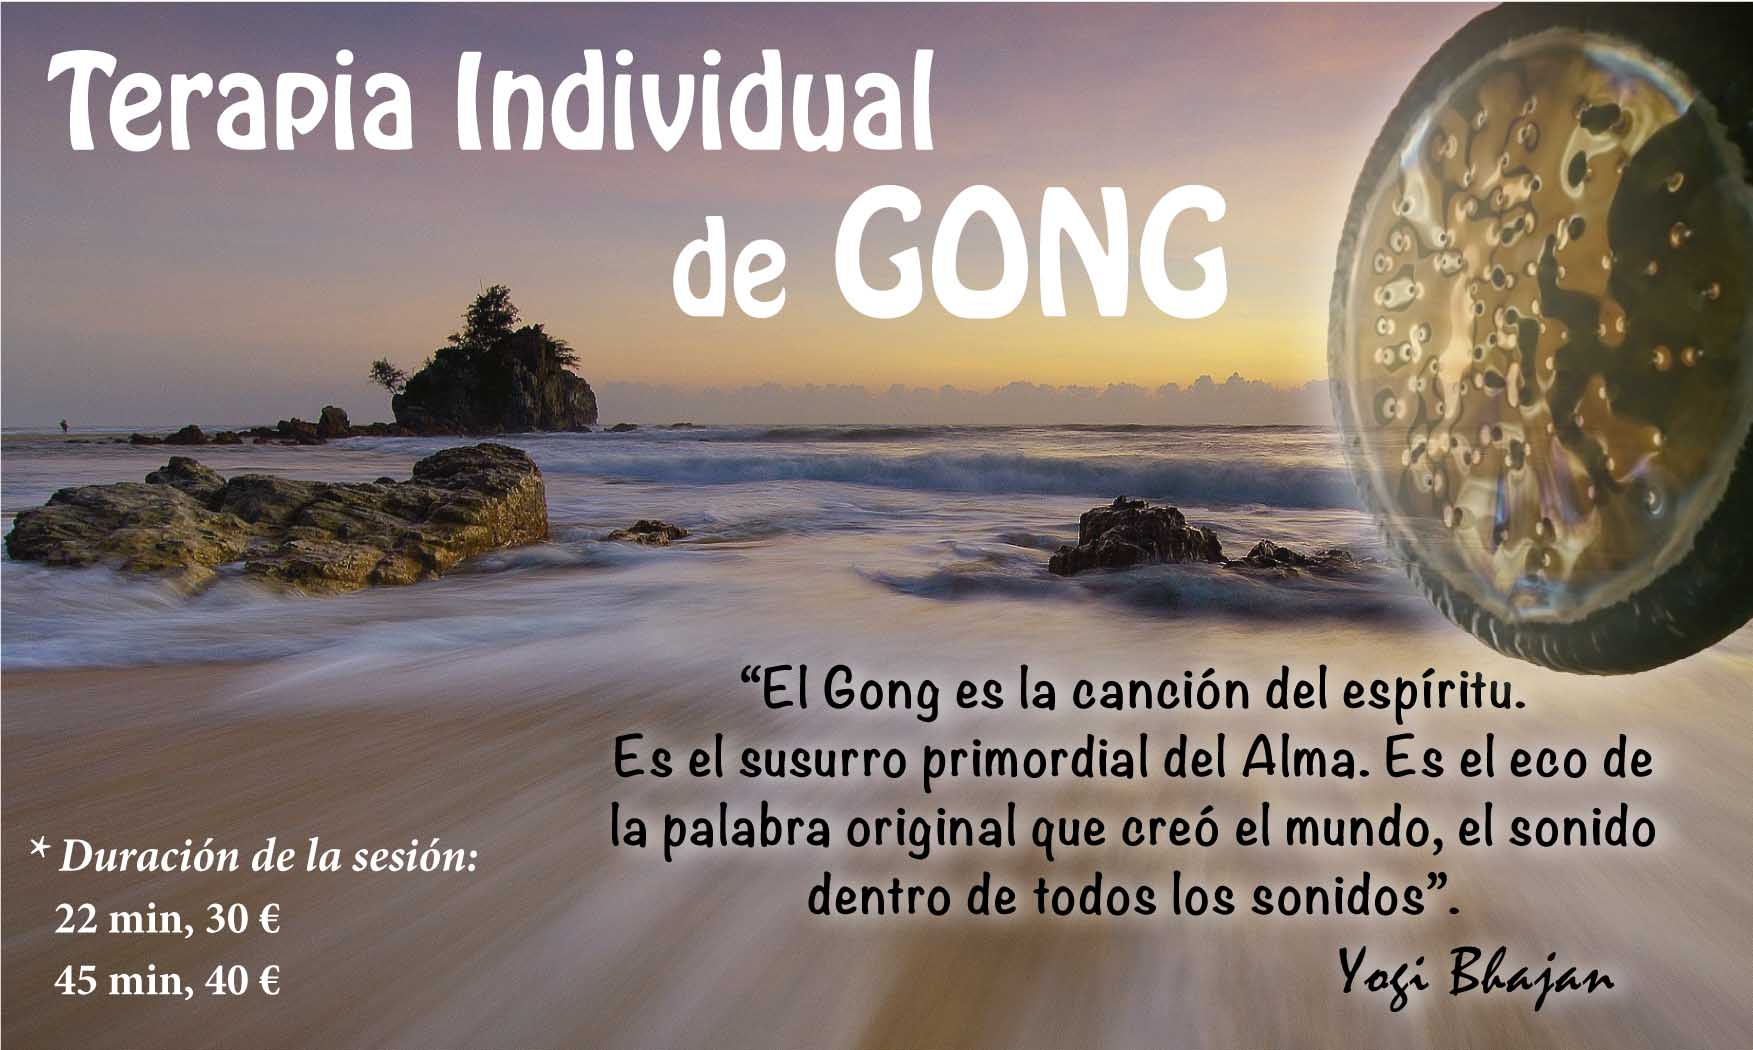 Gong_Individual_Facebook